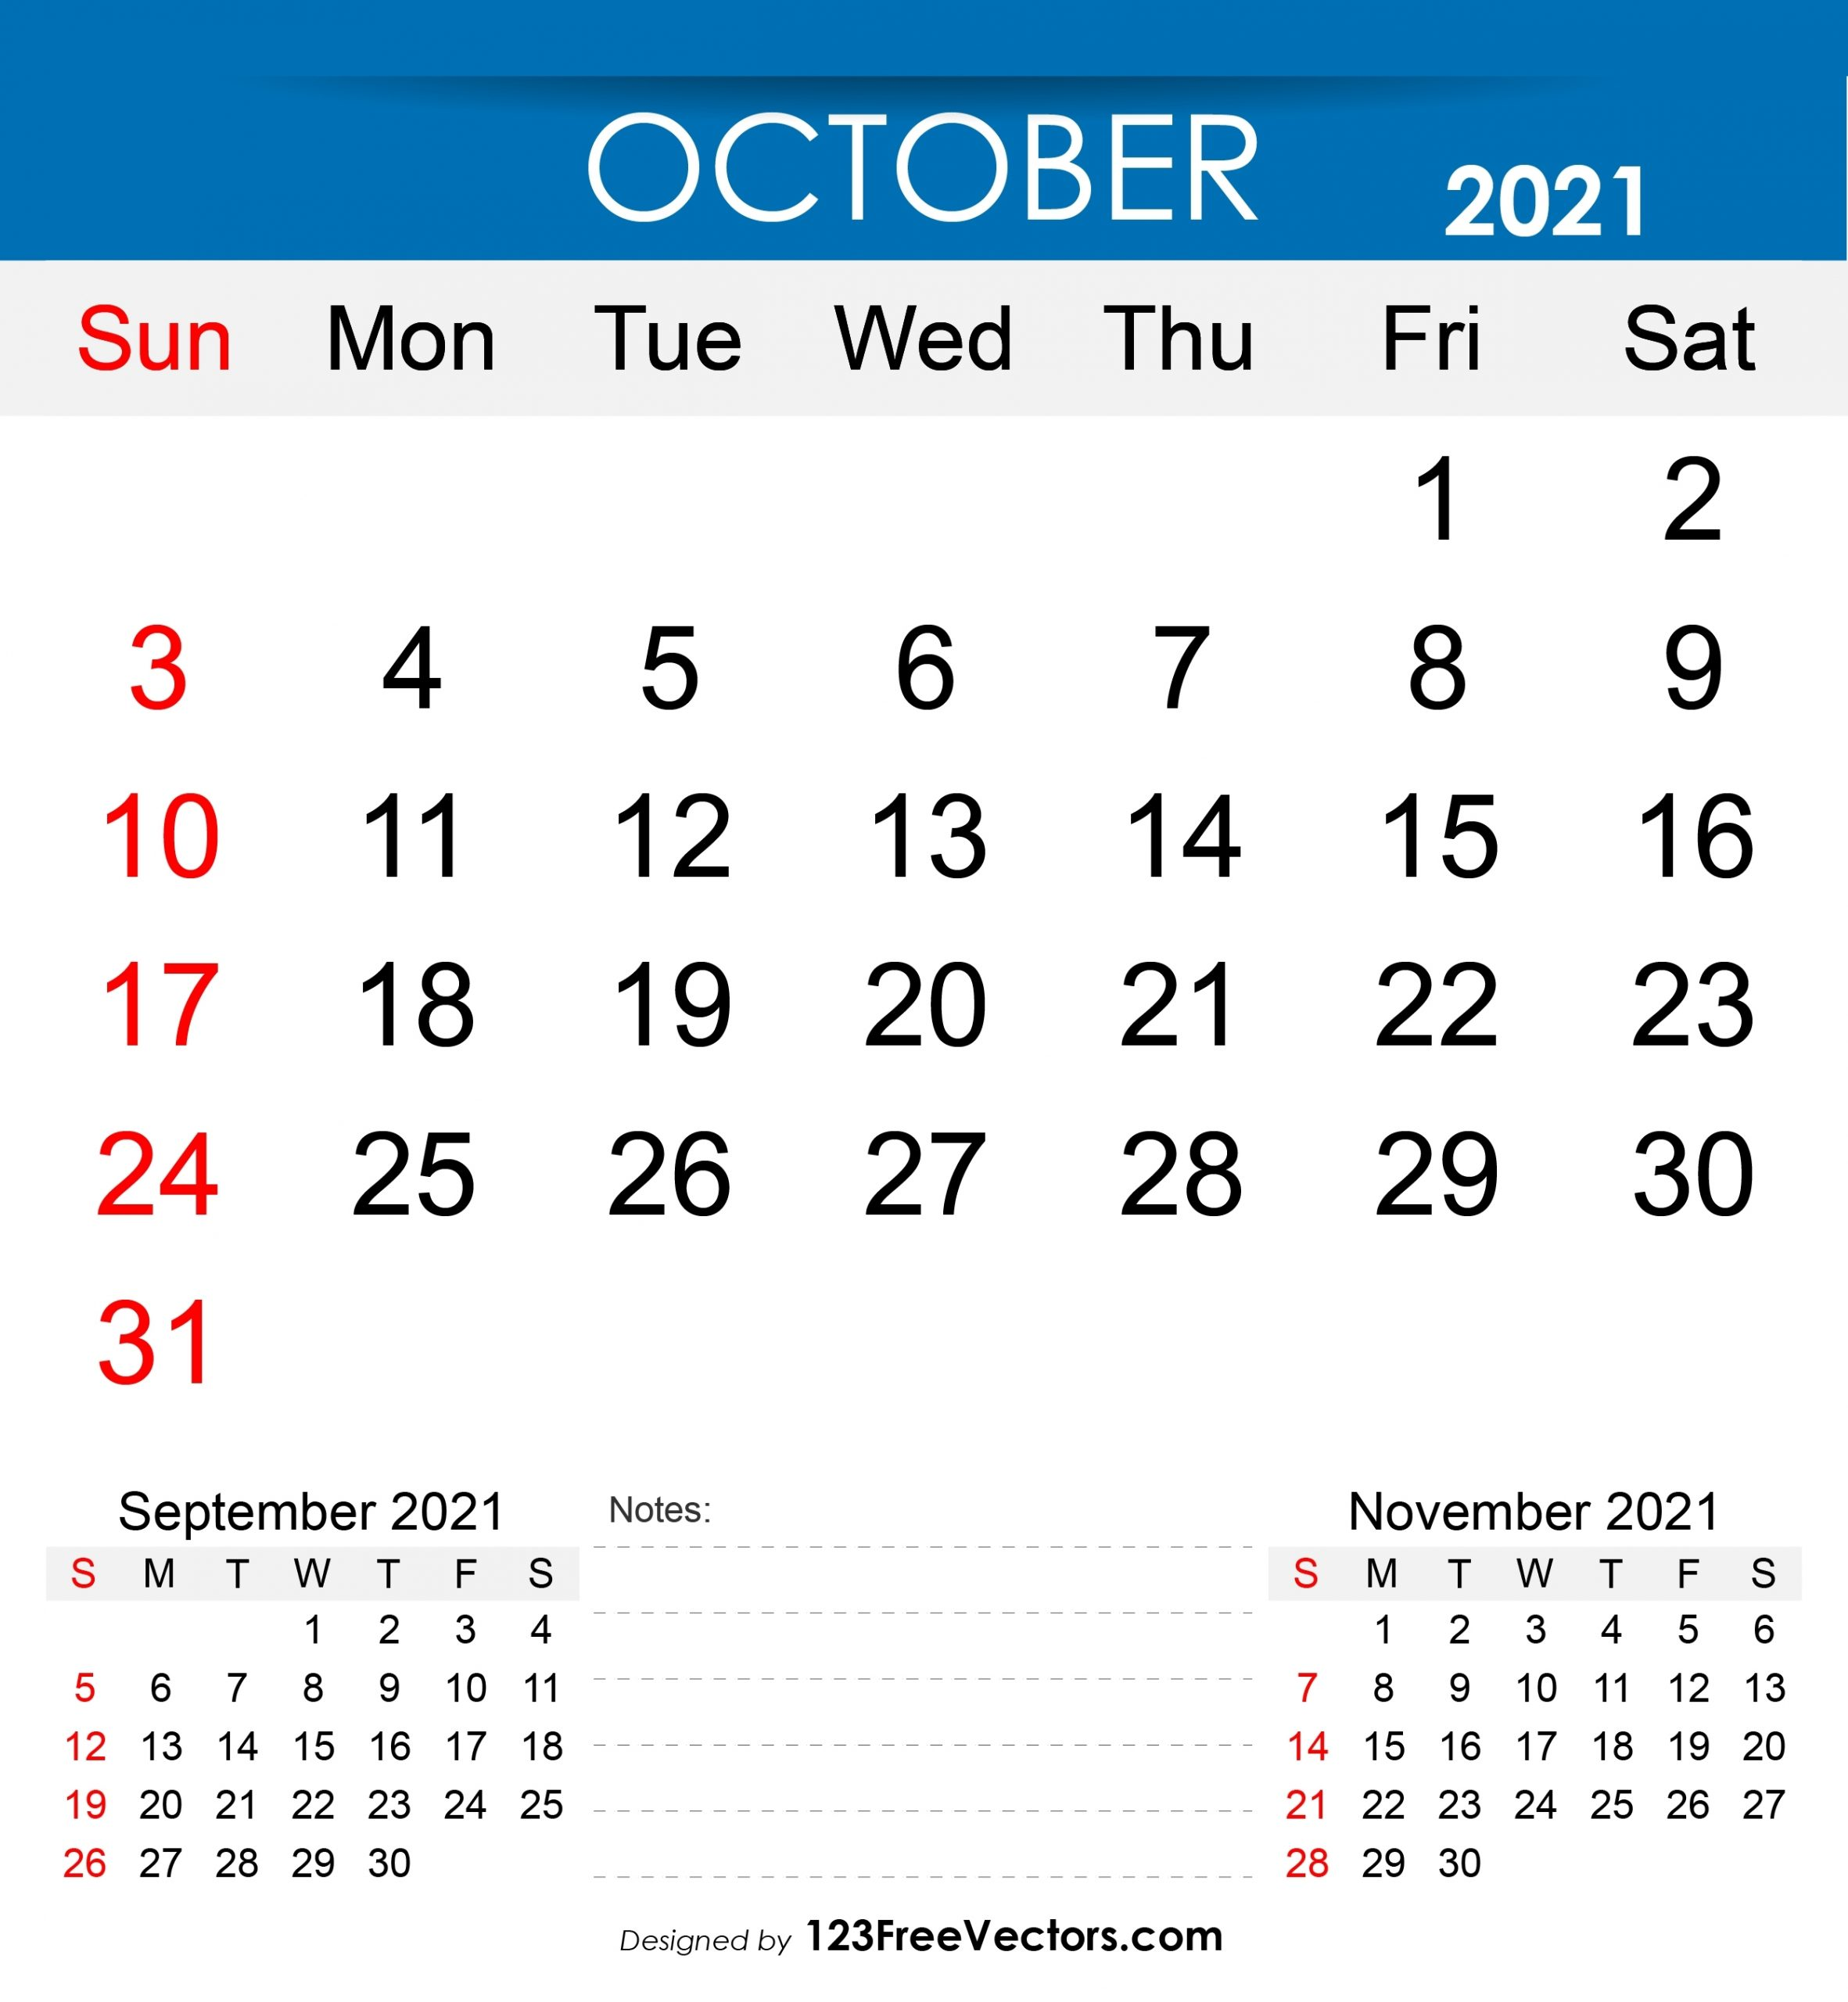 Get August September October 2021